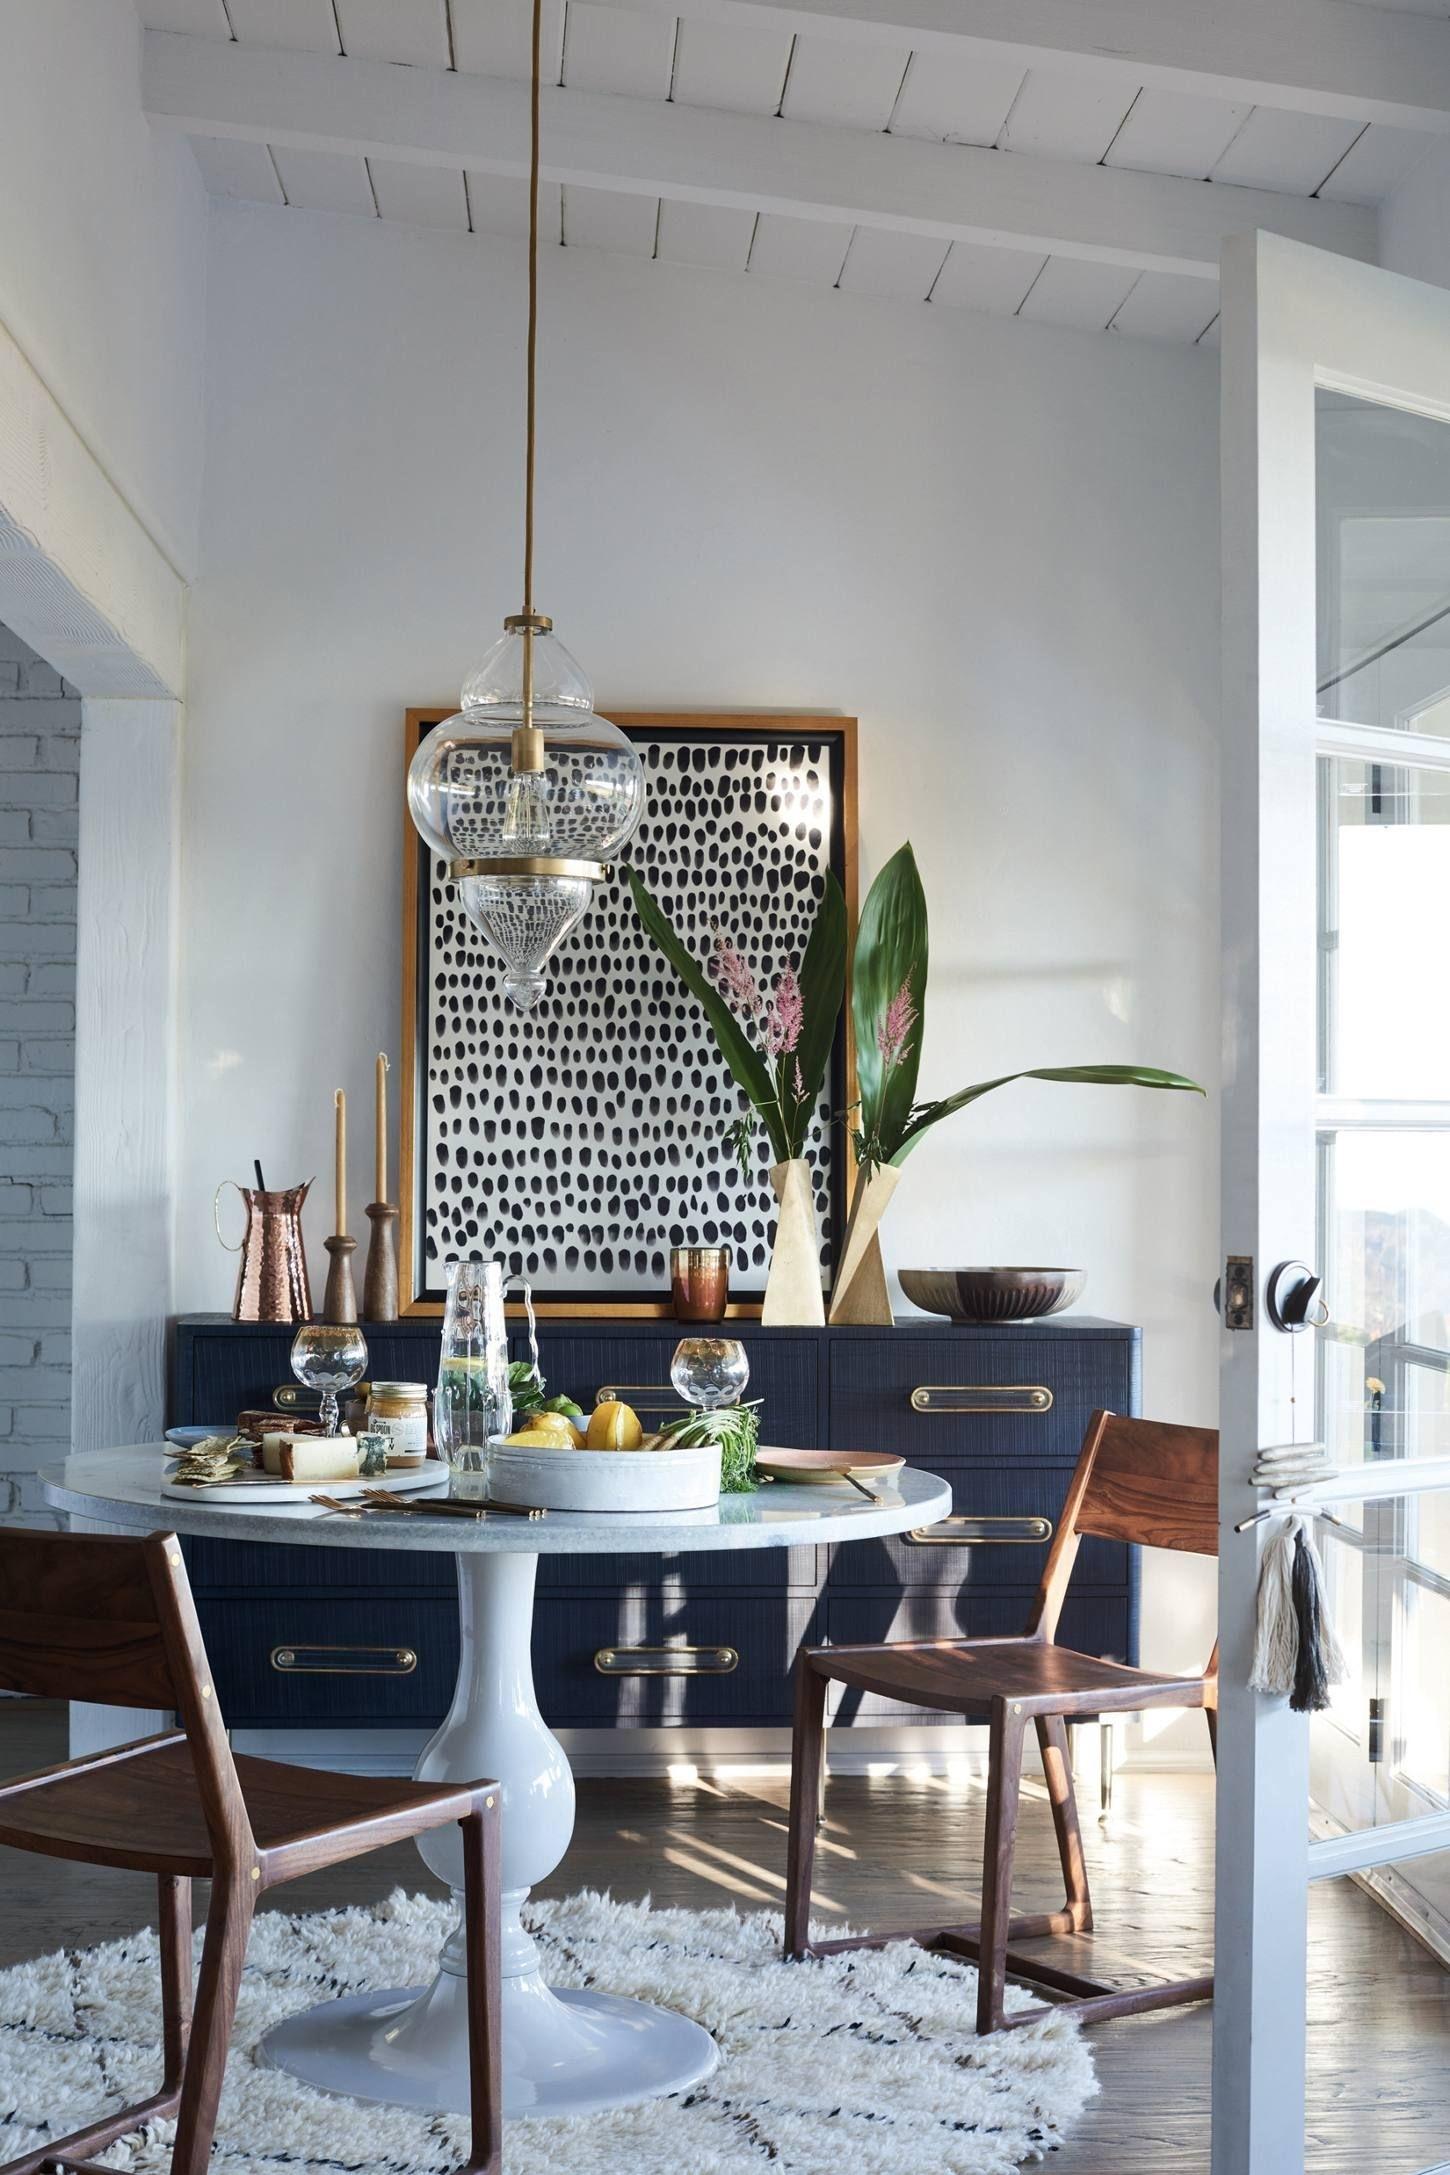 Pointillism Wall Art | New House | Pinterest | Anthropologie Regarding 2018 Dining Room Wall Art (Gallery 13 of 15)